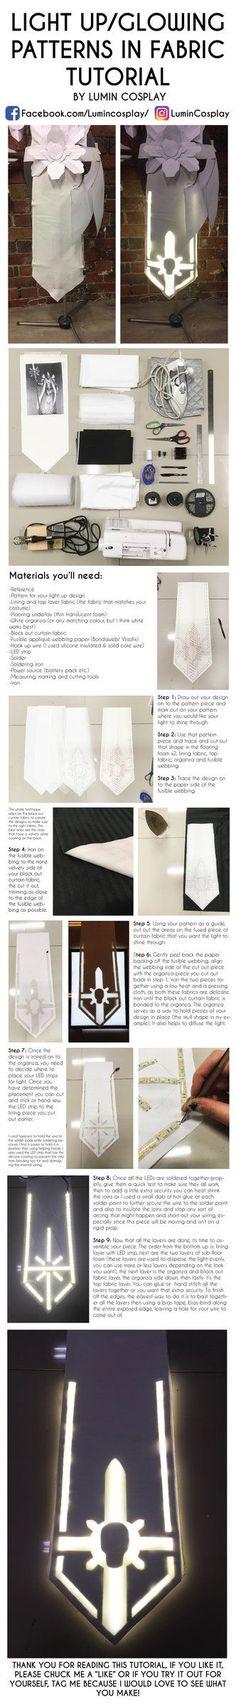 Cosplay light up pattern on fabric tutorial by LuminCosplay.deviantart.com on @DeviantArt